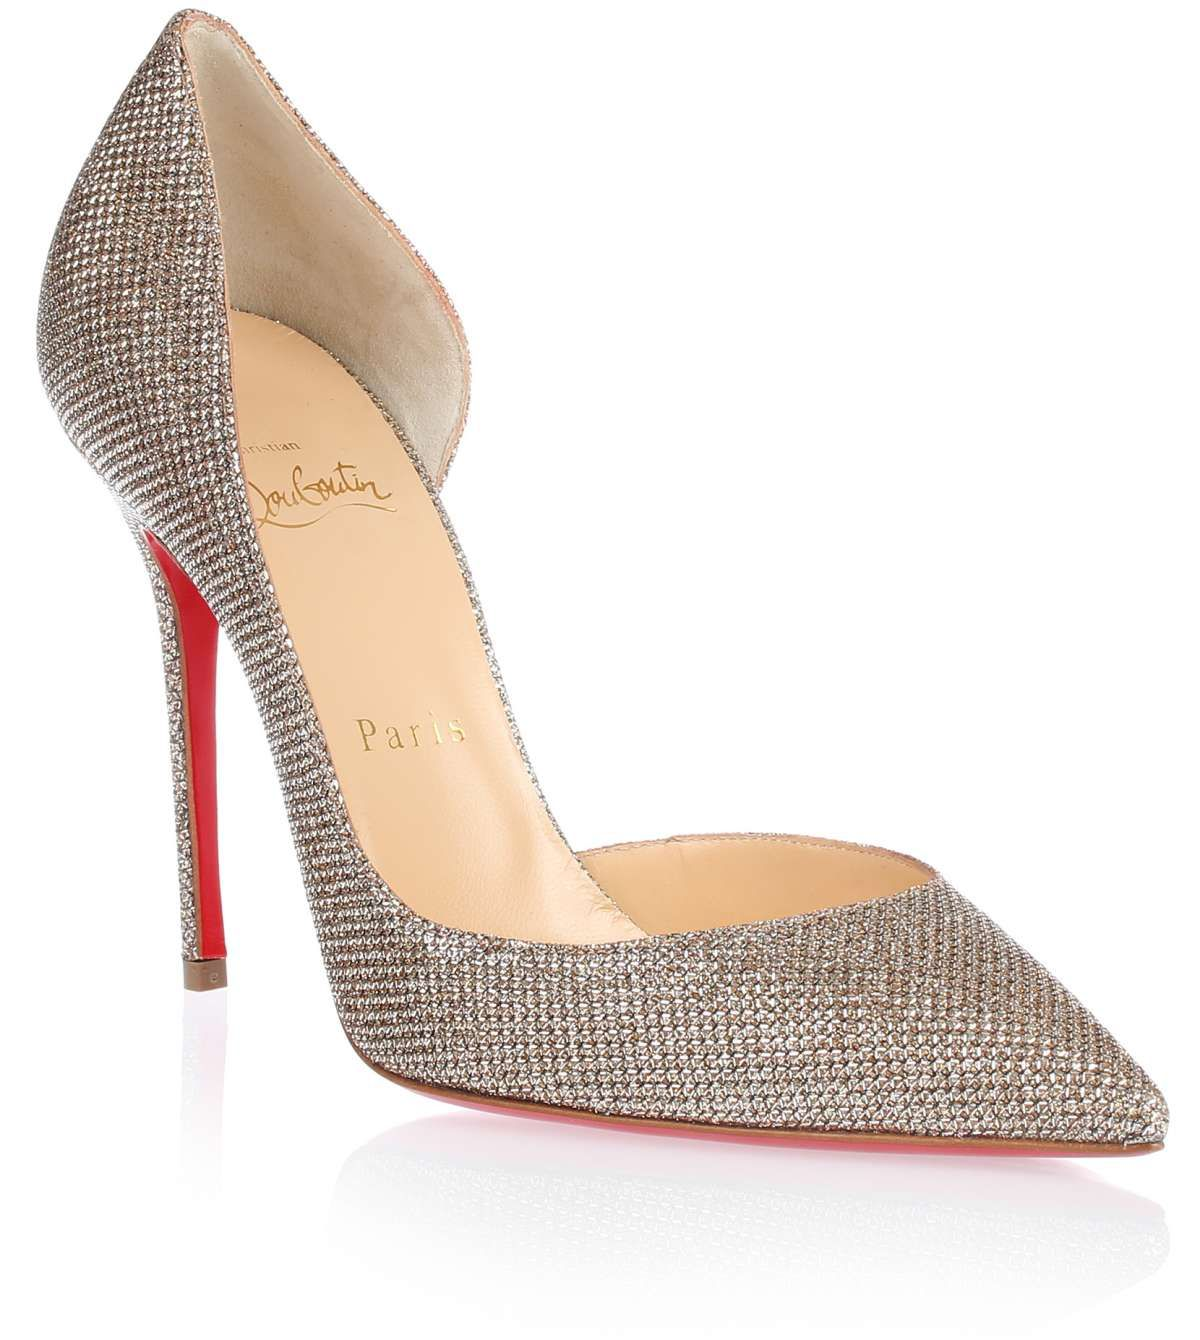 half off 20b95 b6338 Iriza 100 gold glitter pump Christian Louboutin - Savannah's ...